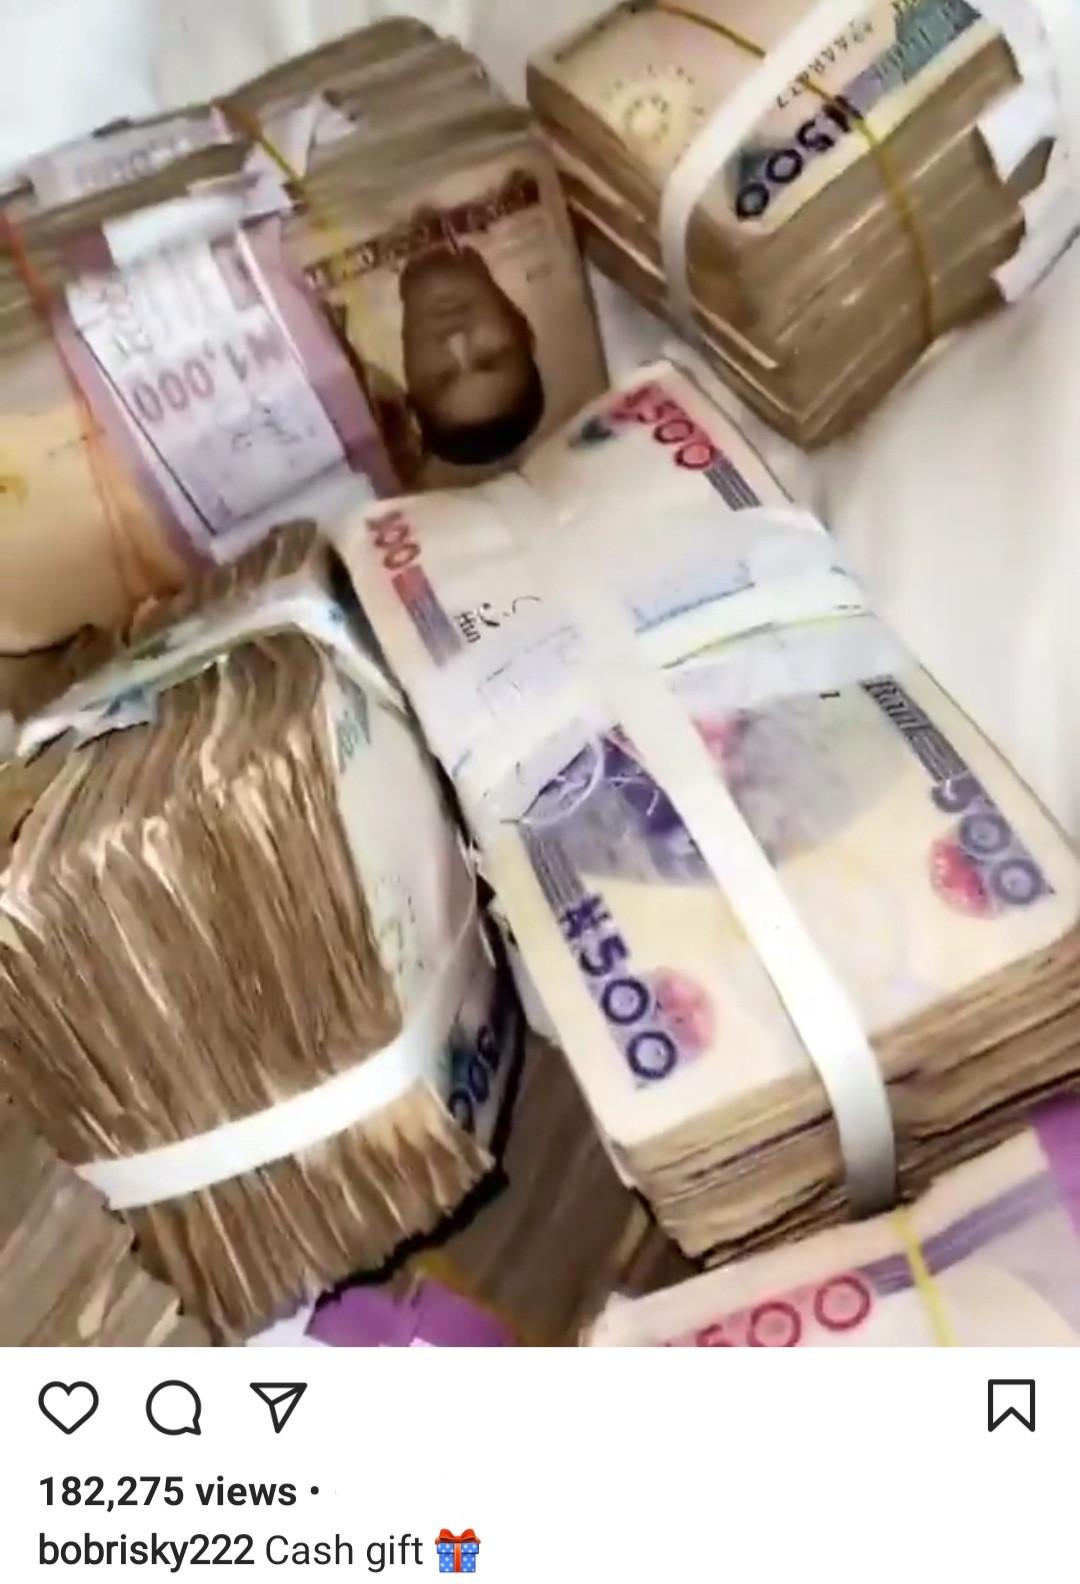 Bobrisky shows off cash gifts he